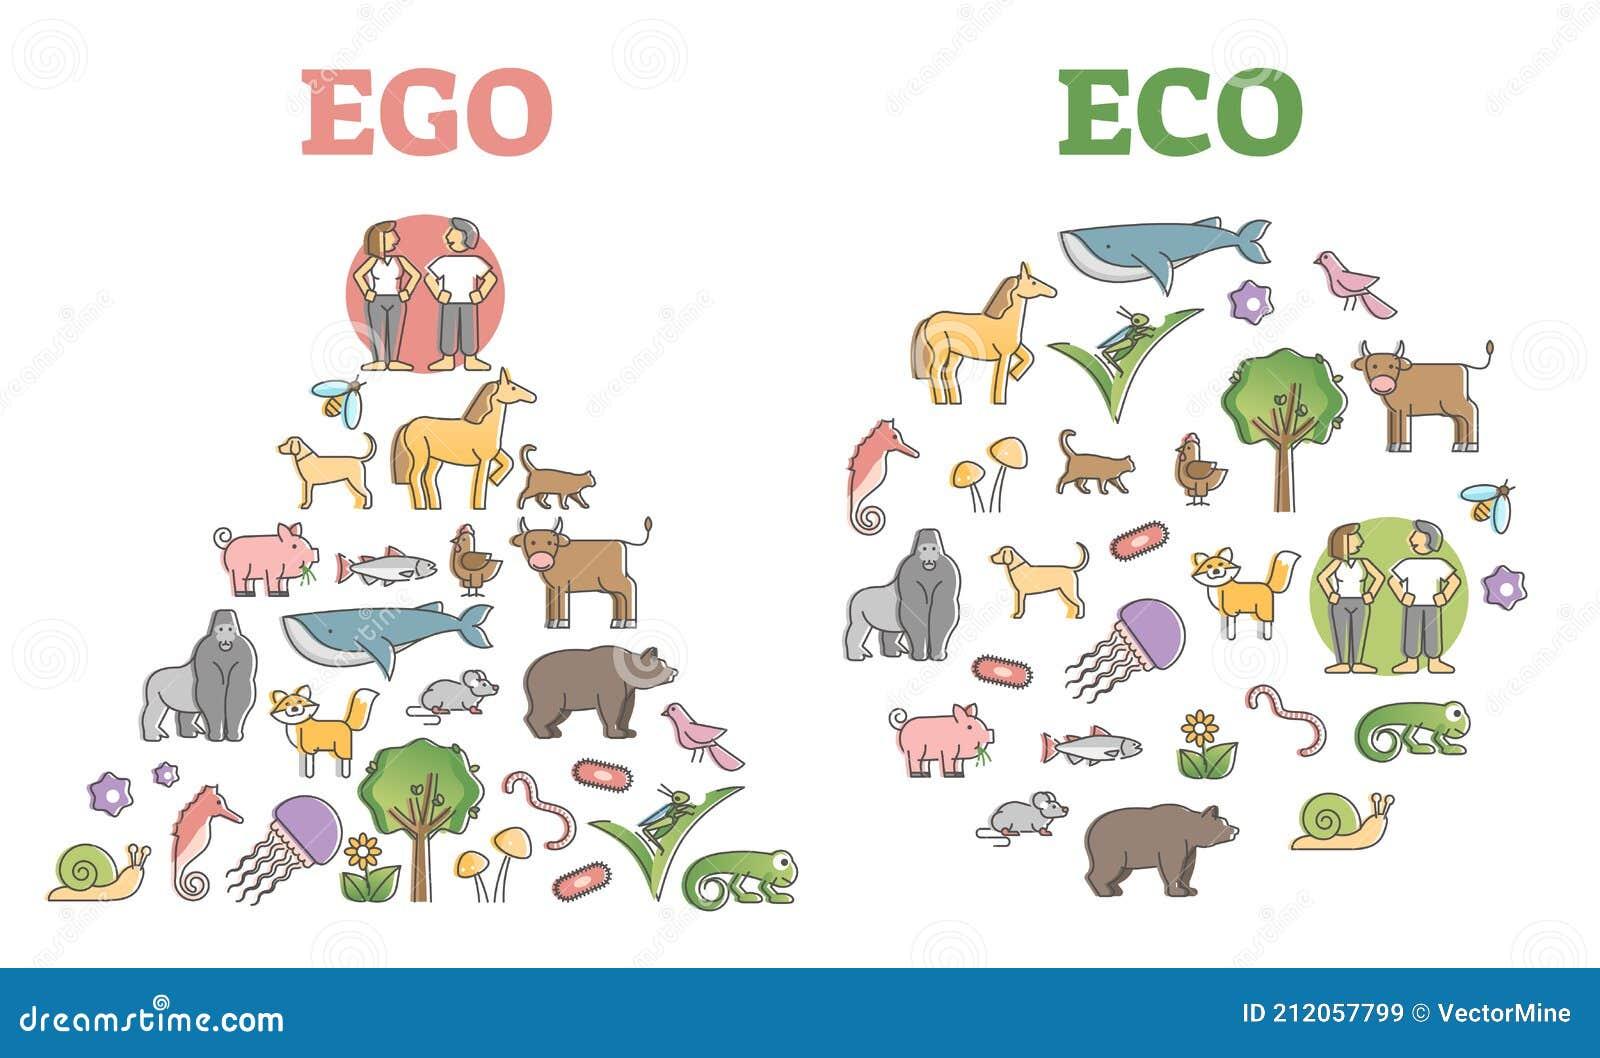 Ecosystem Diagram Vector Illustration | CartoonDealer.com ...